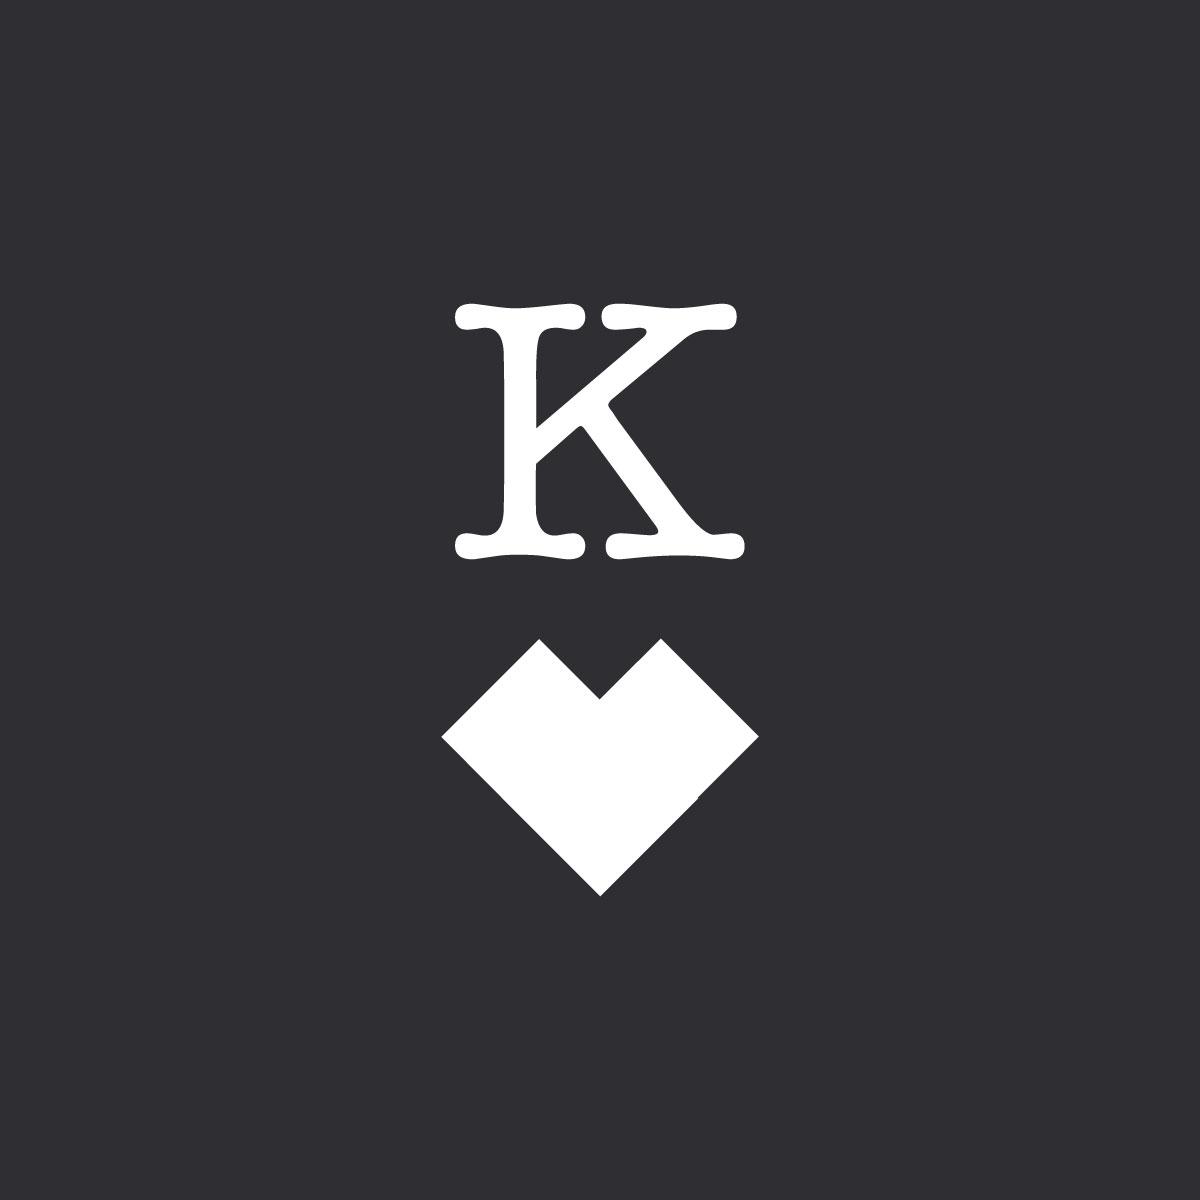 KING OF HEARTS design by kikicutt sweatpants store